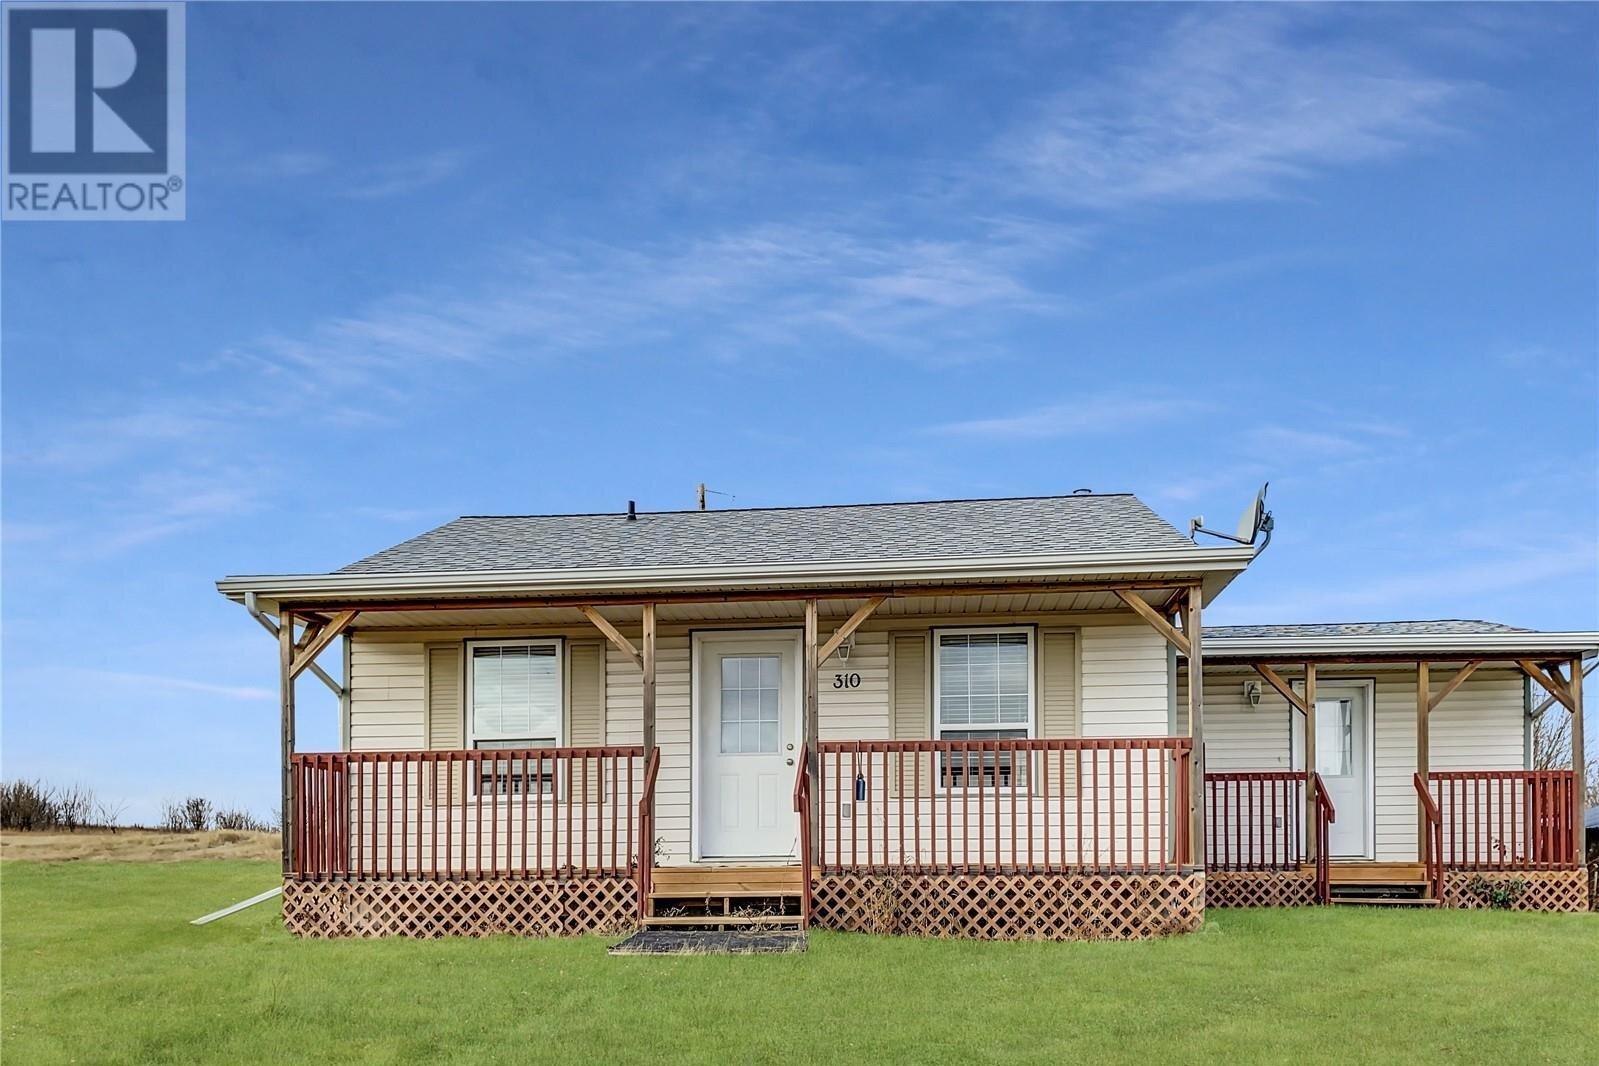 Residential property for sale at 310 Richard St Manitou Beach Saskatchewan - MLS: SK818743